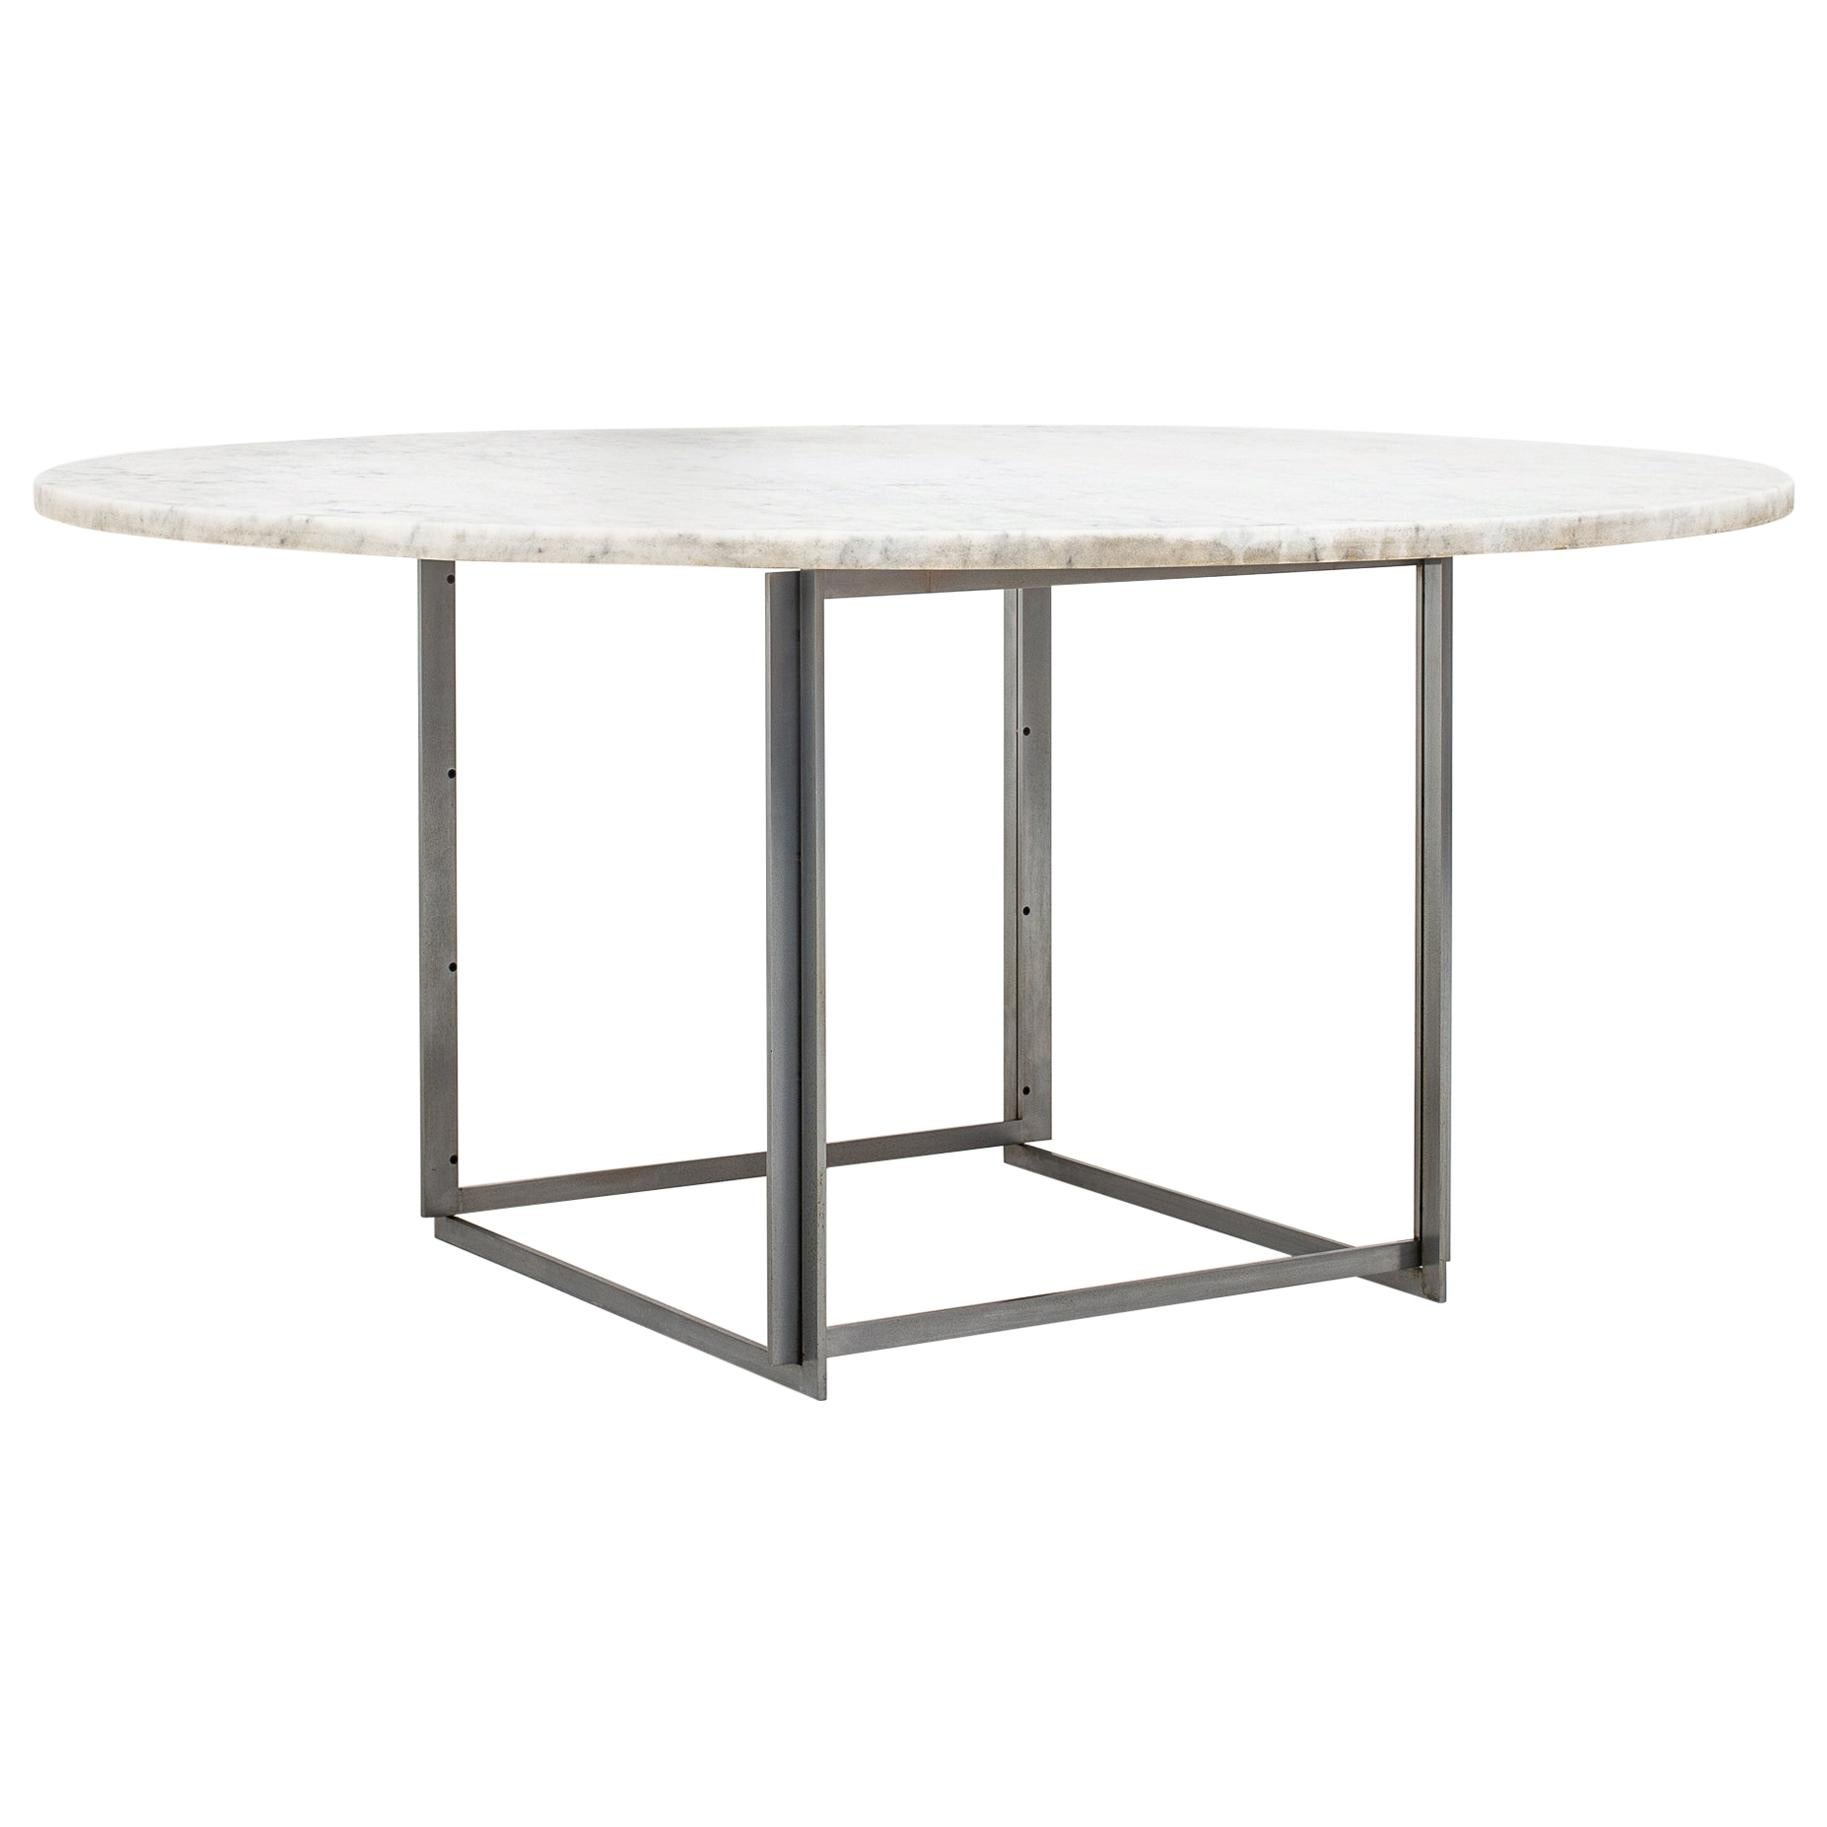 PK 54 Dining Table by Poul Kjærholm